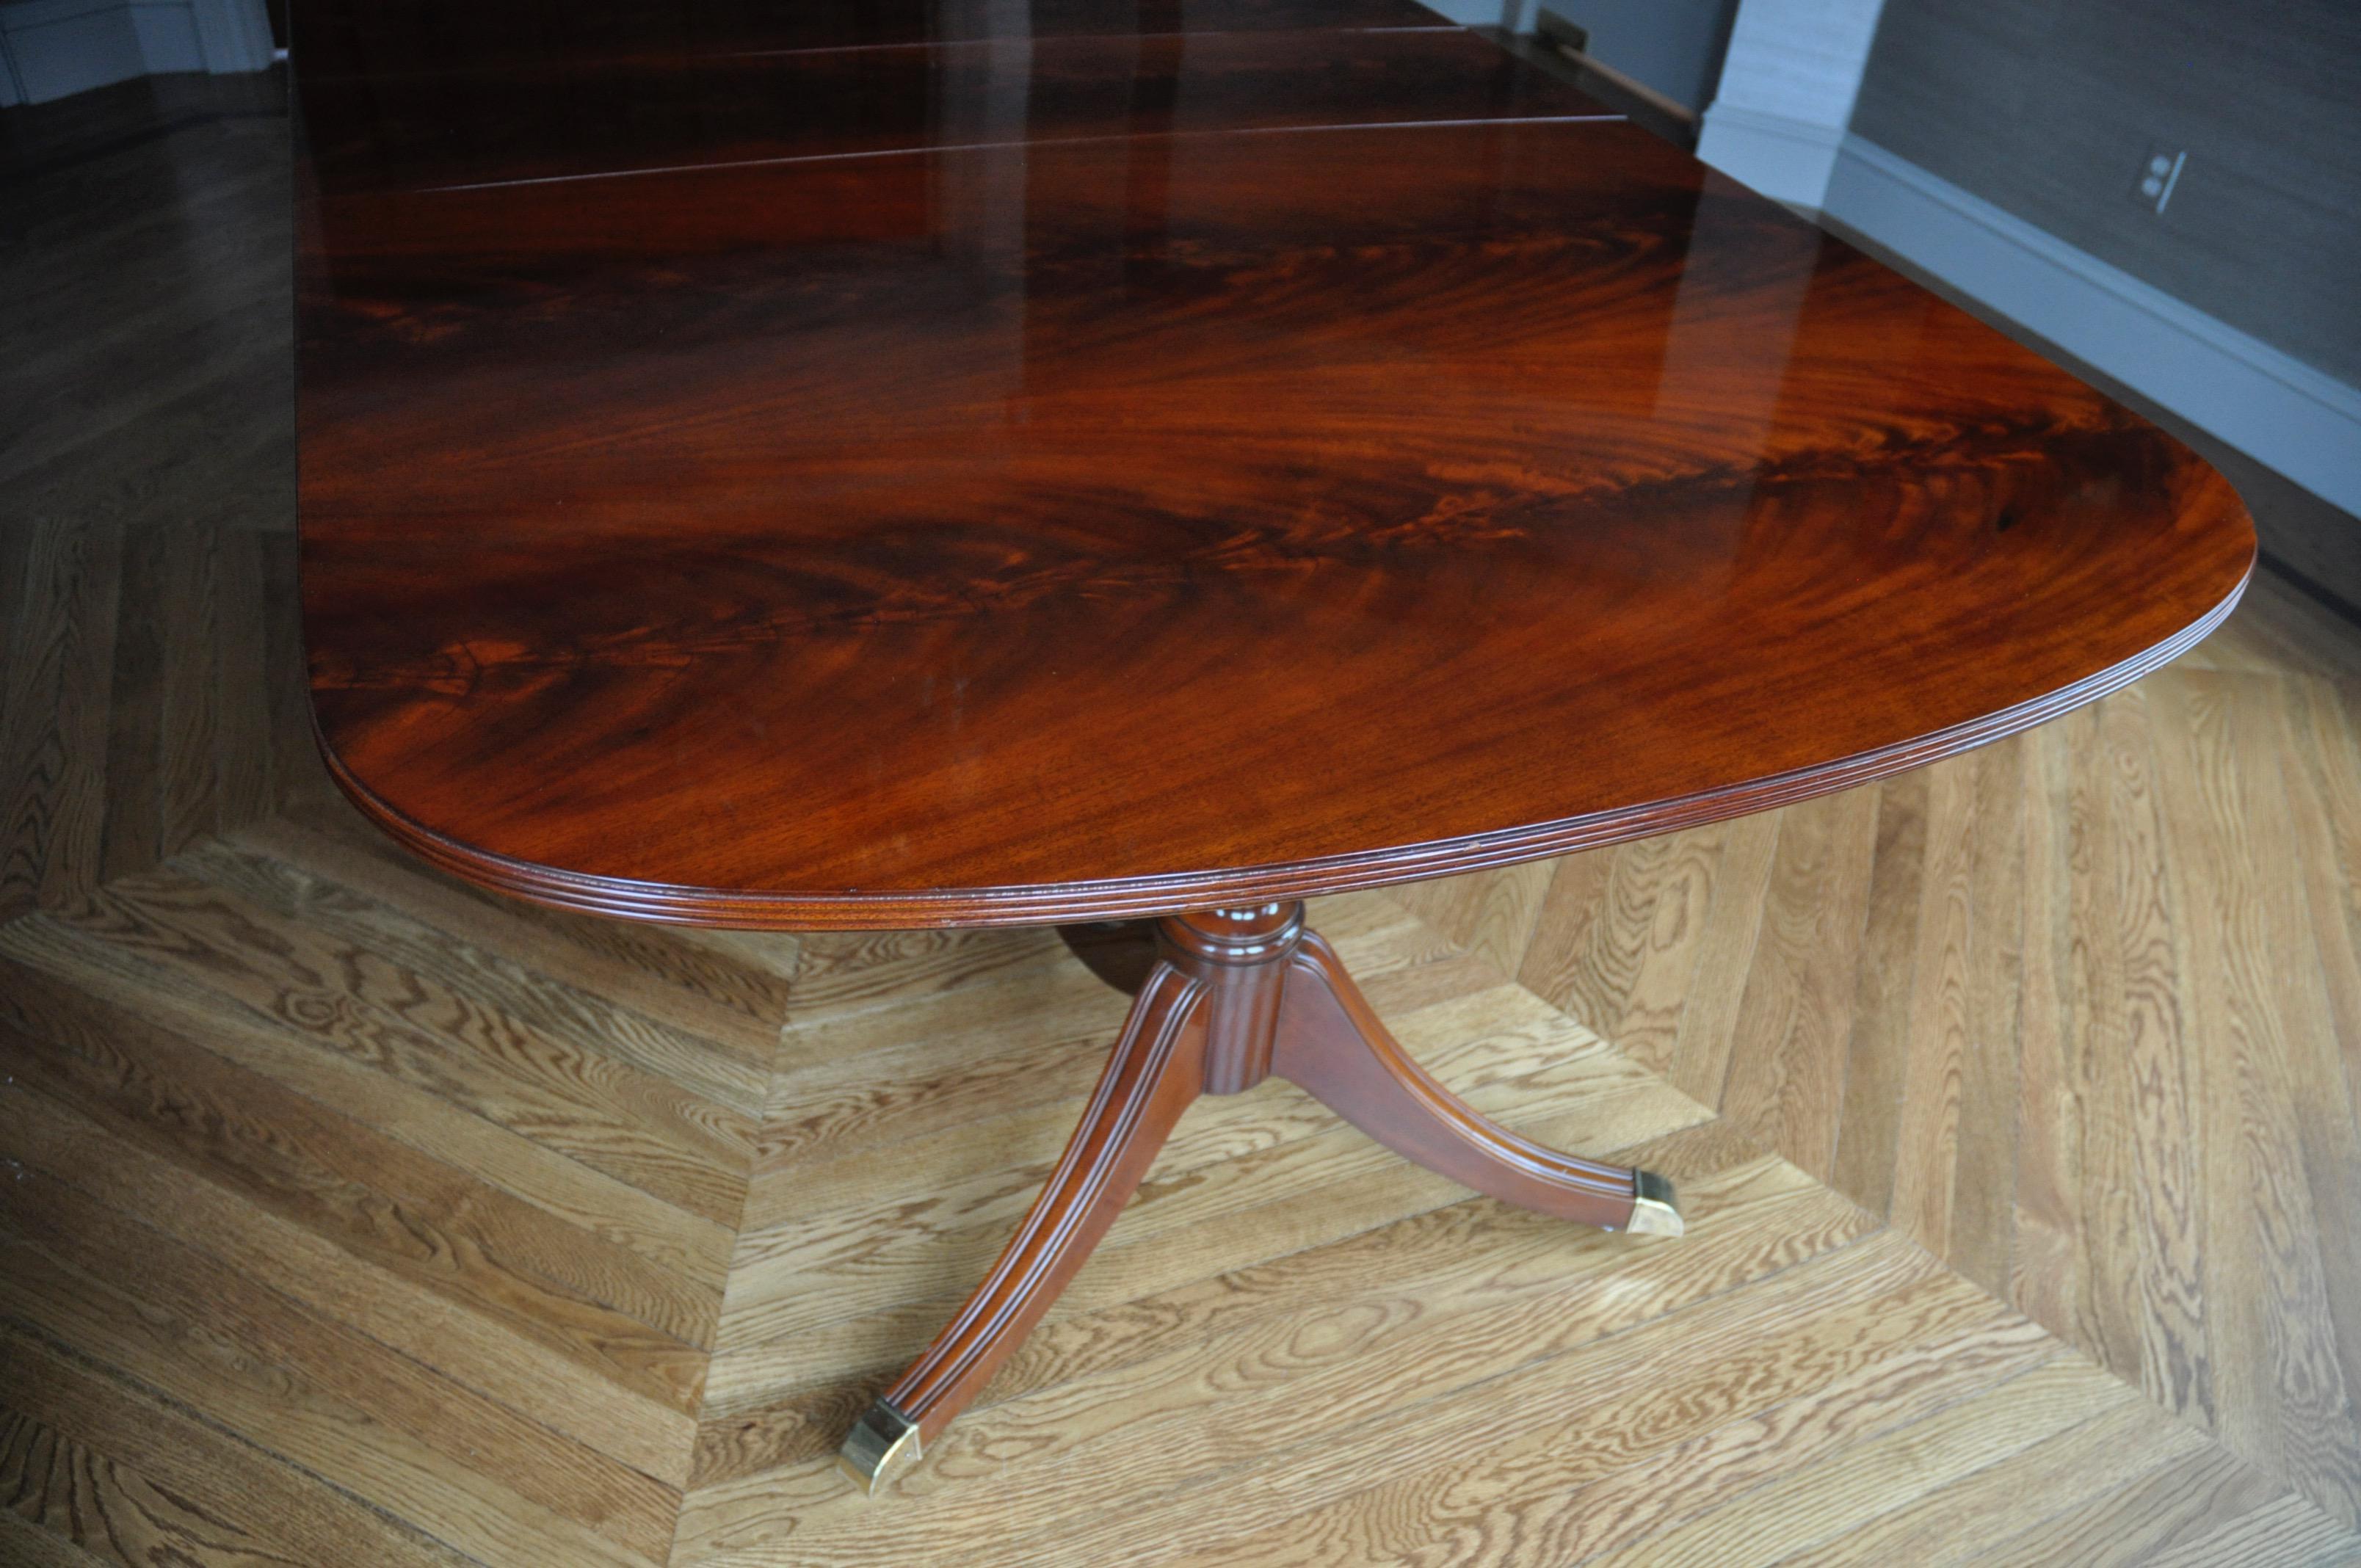 Kindel Crotch Mahogany Pedestal Dining Table Chairish : 26b0858e e711 4d1d be61 26f9013e88d3aspectfitampwidth640ampheight640 from www.chairish.com size 640 x 640 jpeg 43kB